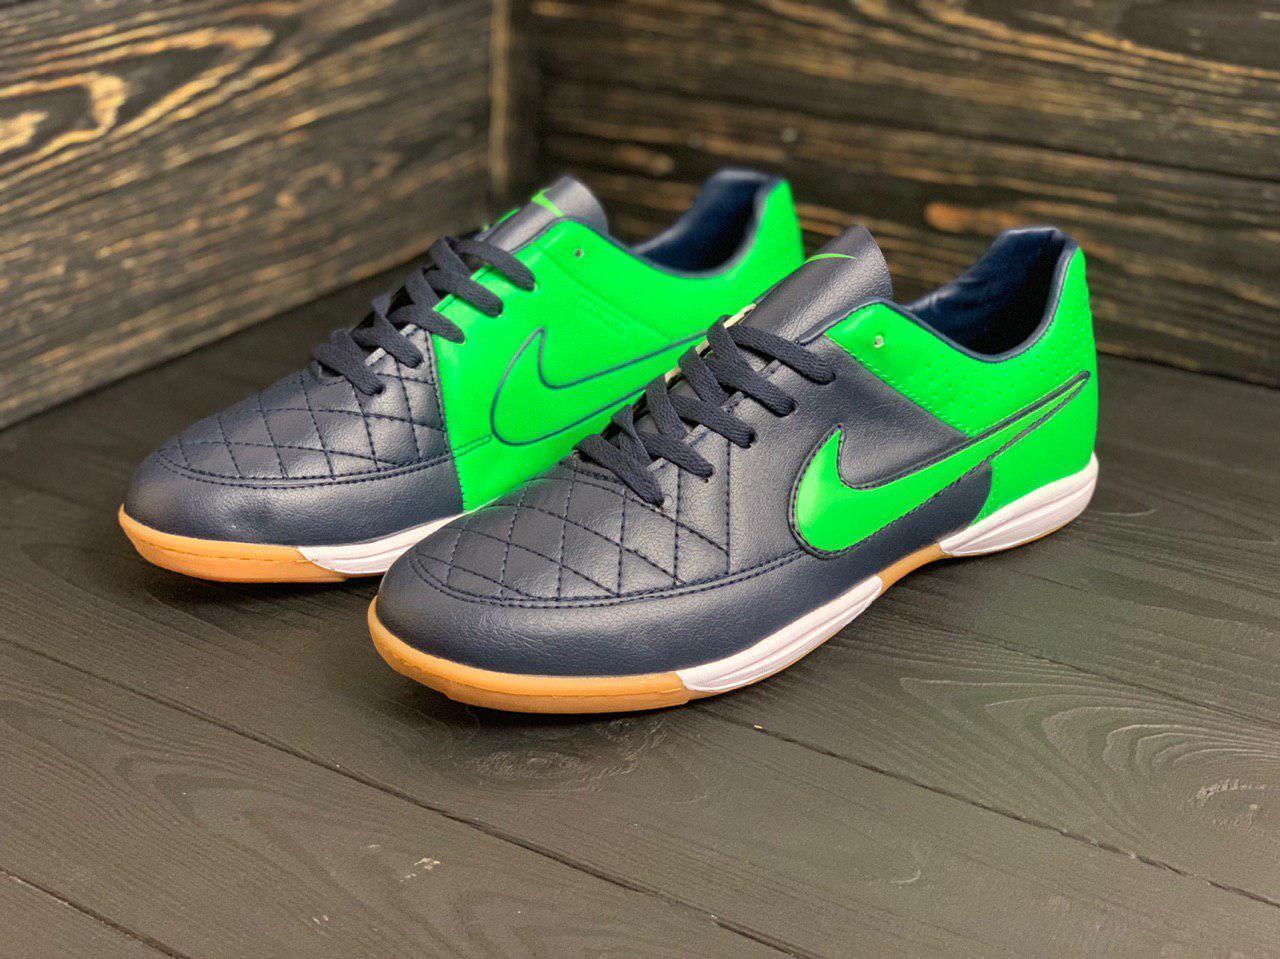 0516555d79a1ac Футзалки Nike Tiempo (реплика) 1075 — в Категории